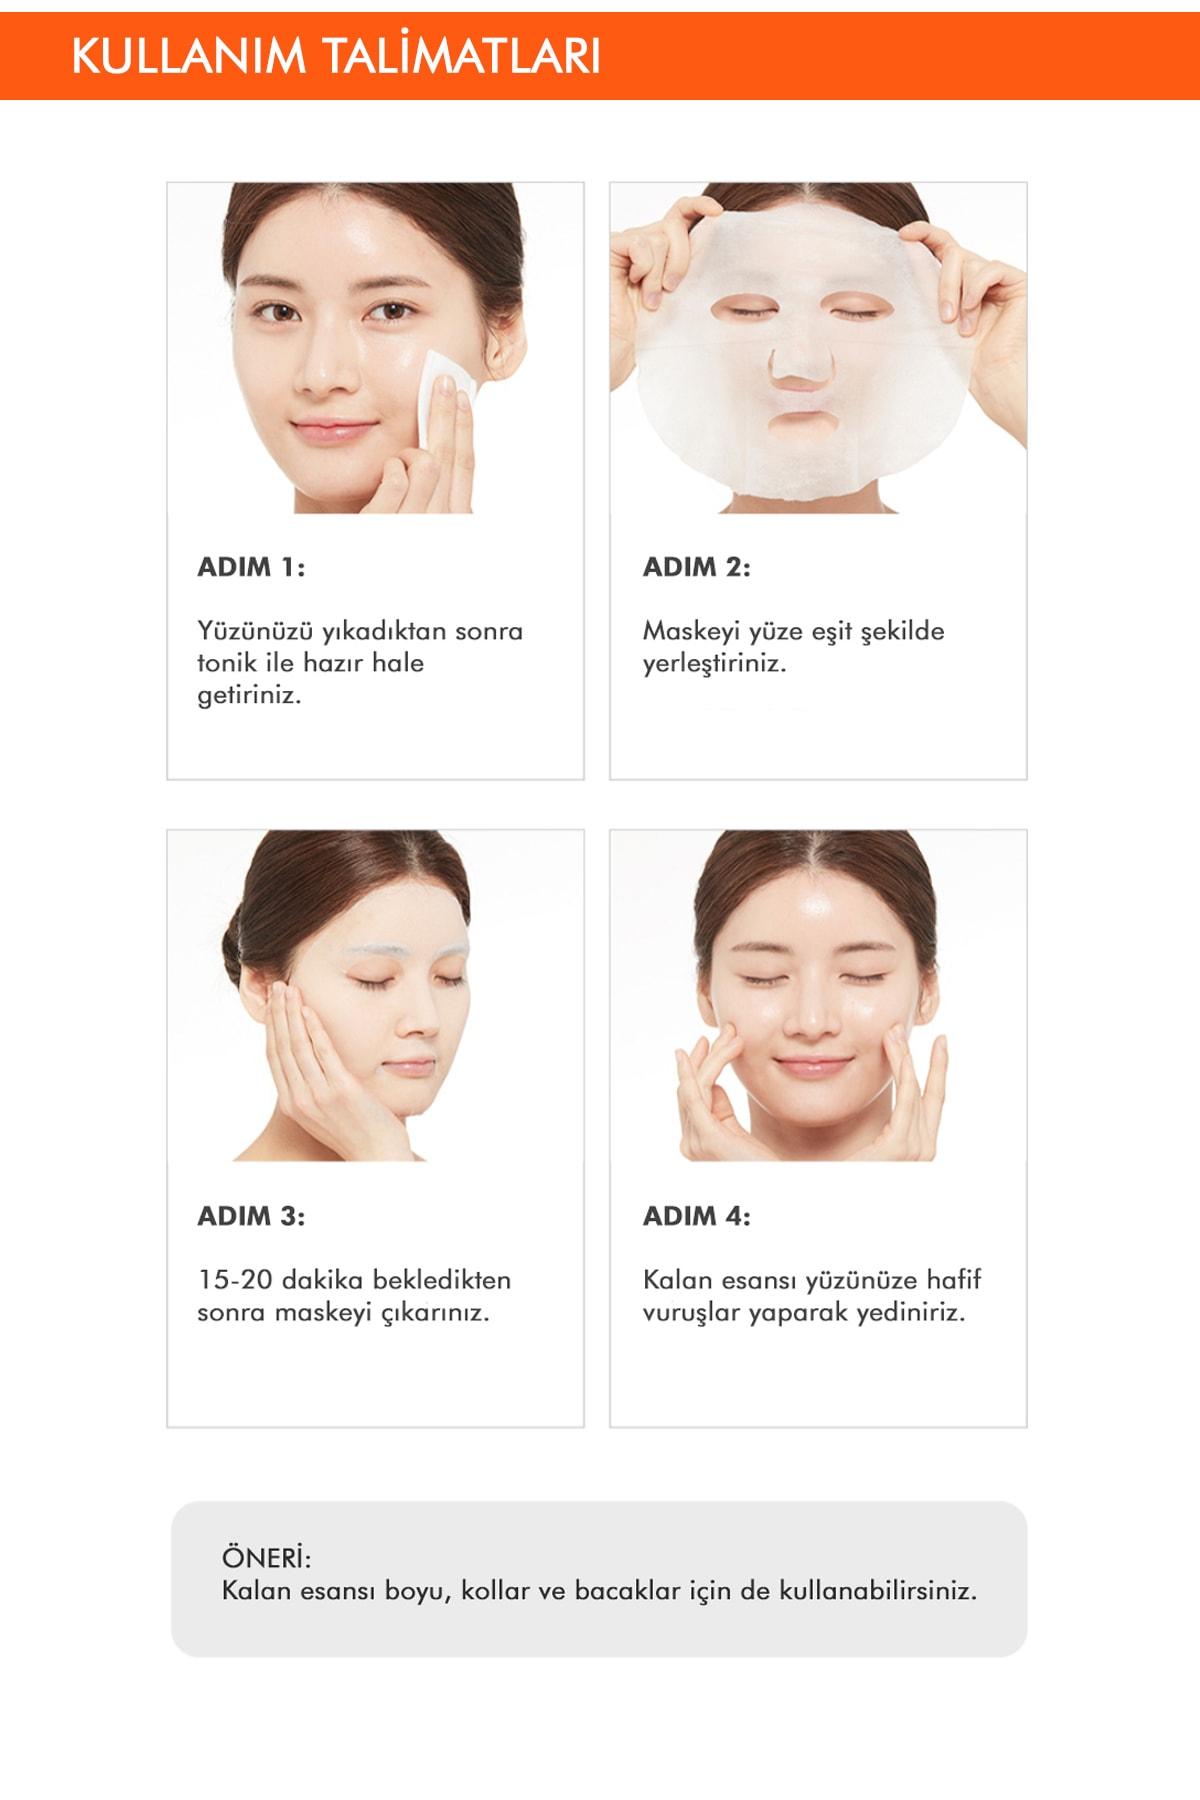 Missha Bal İçerikli Yoğun Nemlendirici Yaprak Maske (1ad) Airy Fit Sheet Mask Honey 3